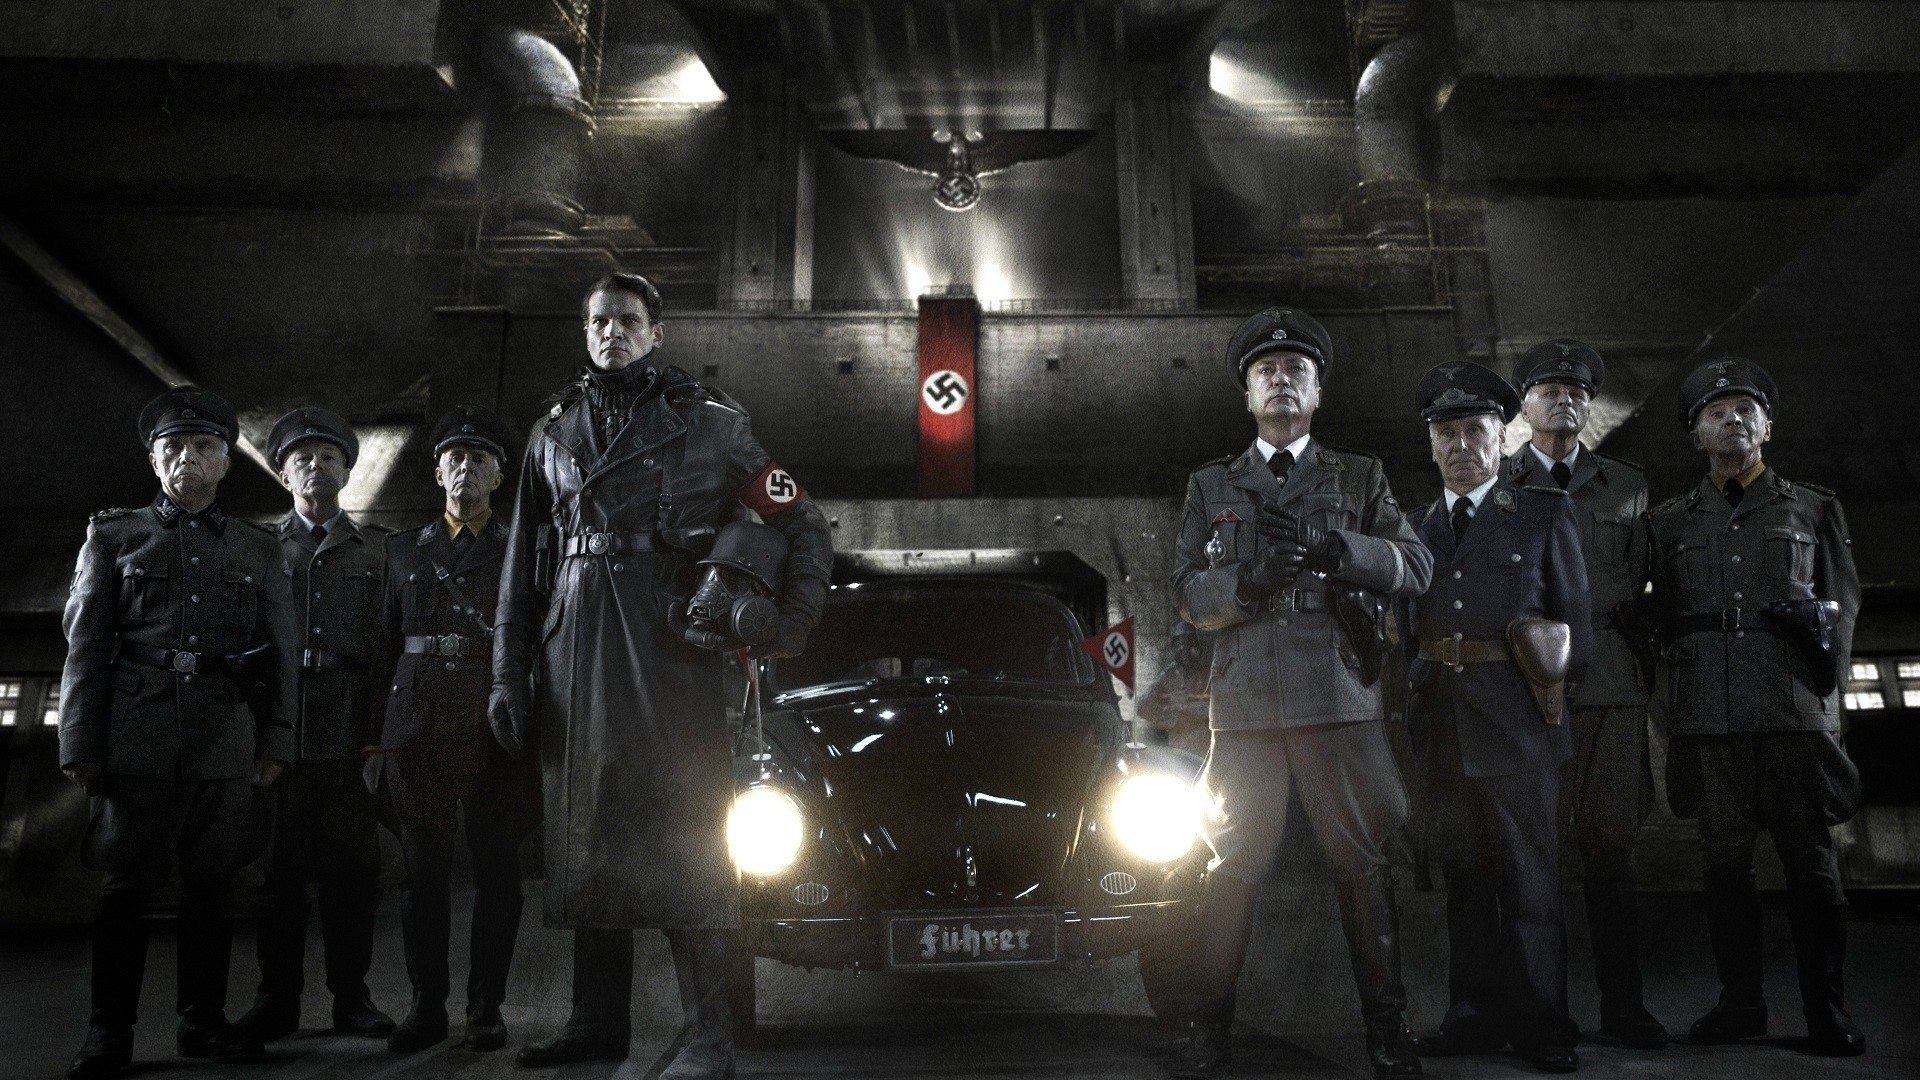 Farrell's Redux Photos ( httpswww.anmysite.comtopwallpaper-nazi-ss.html ) 38884494-nazi-wallpapers